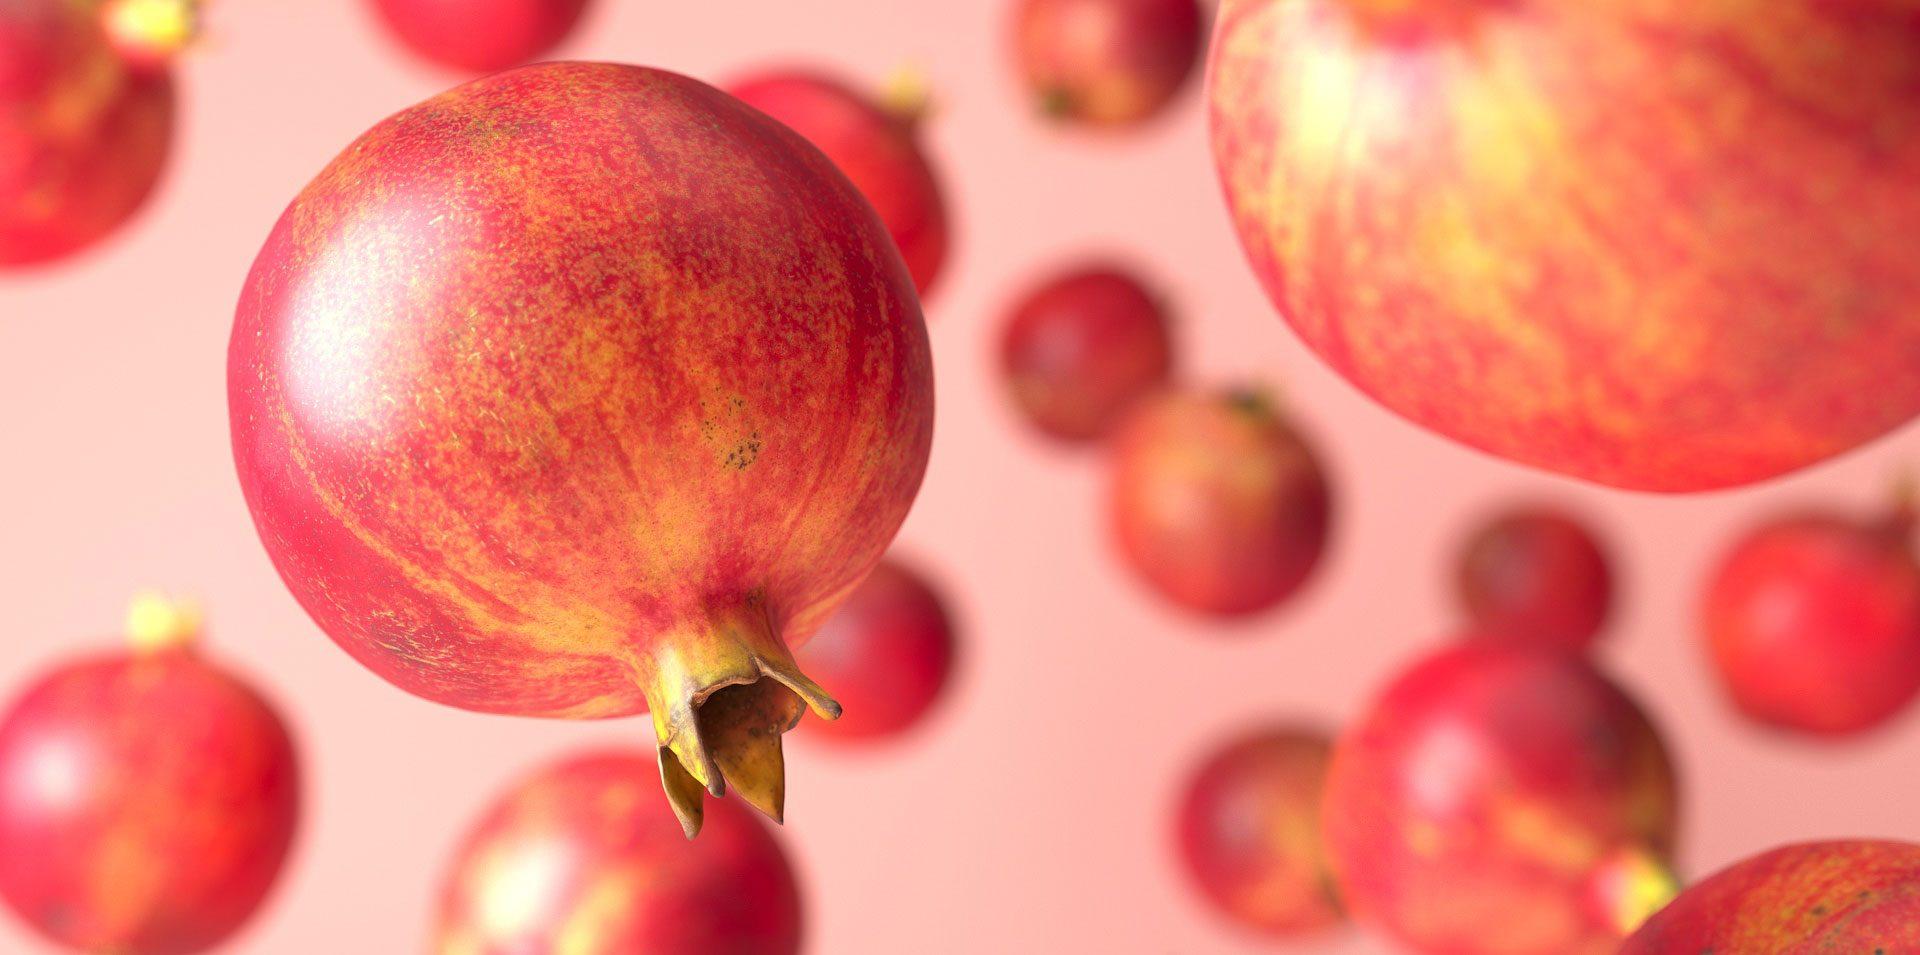 3d rendering of falling pomegranate 3d models